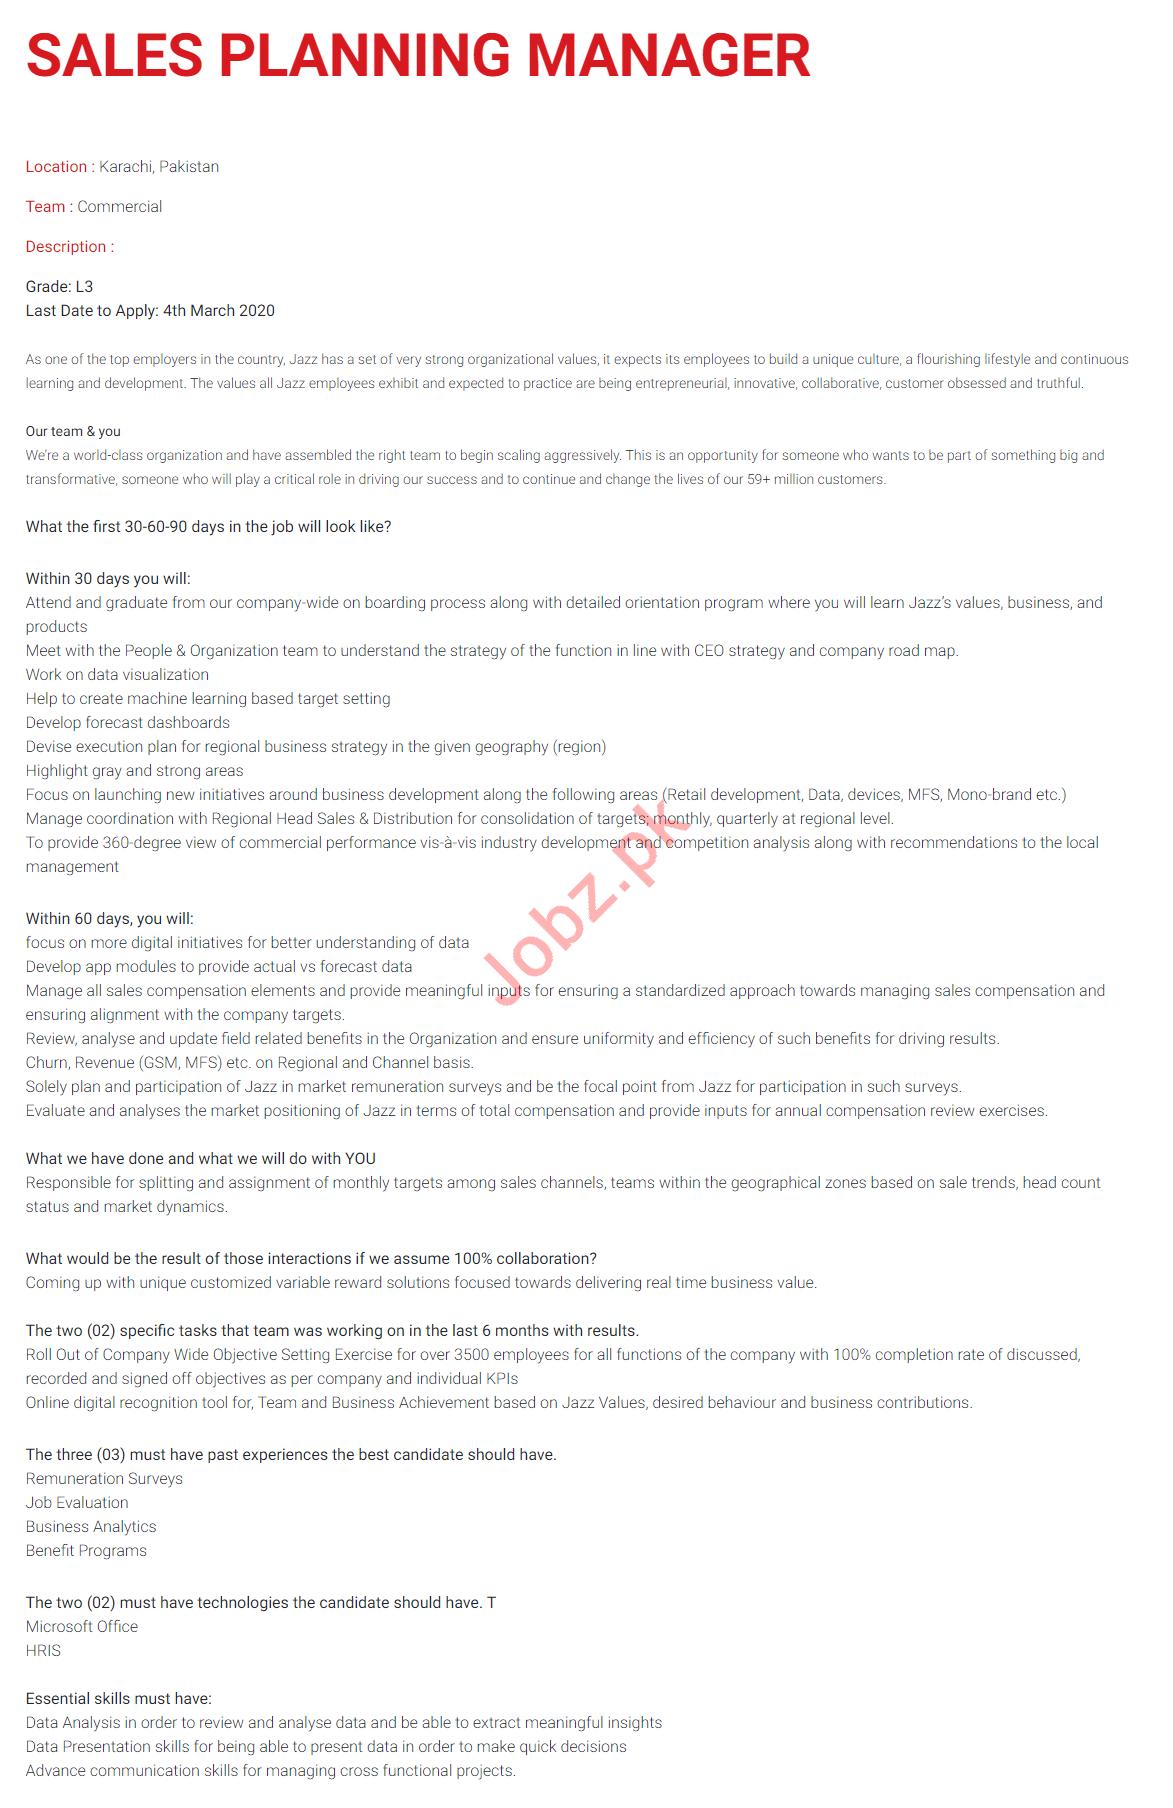 Sales Planning Manager Jobs 2020 in Jazz Telecom Karachi